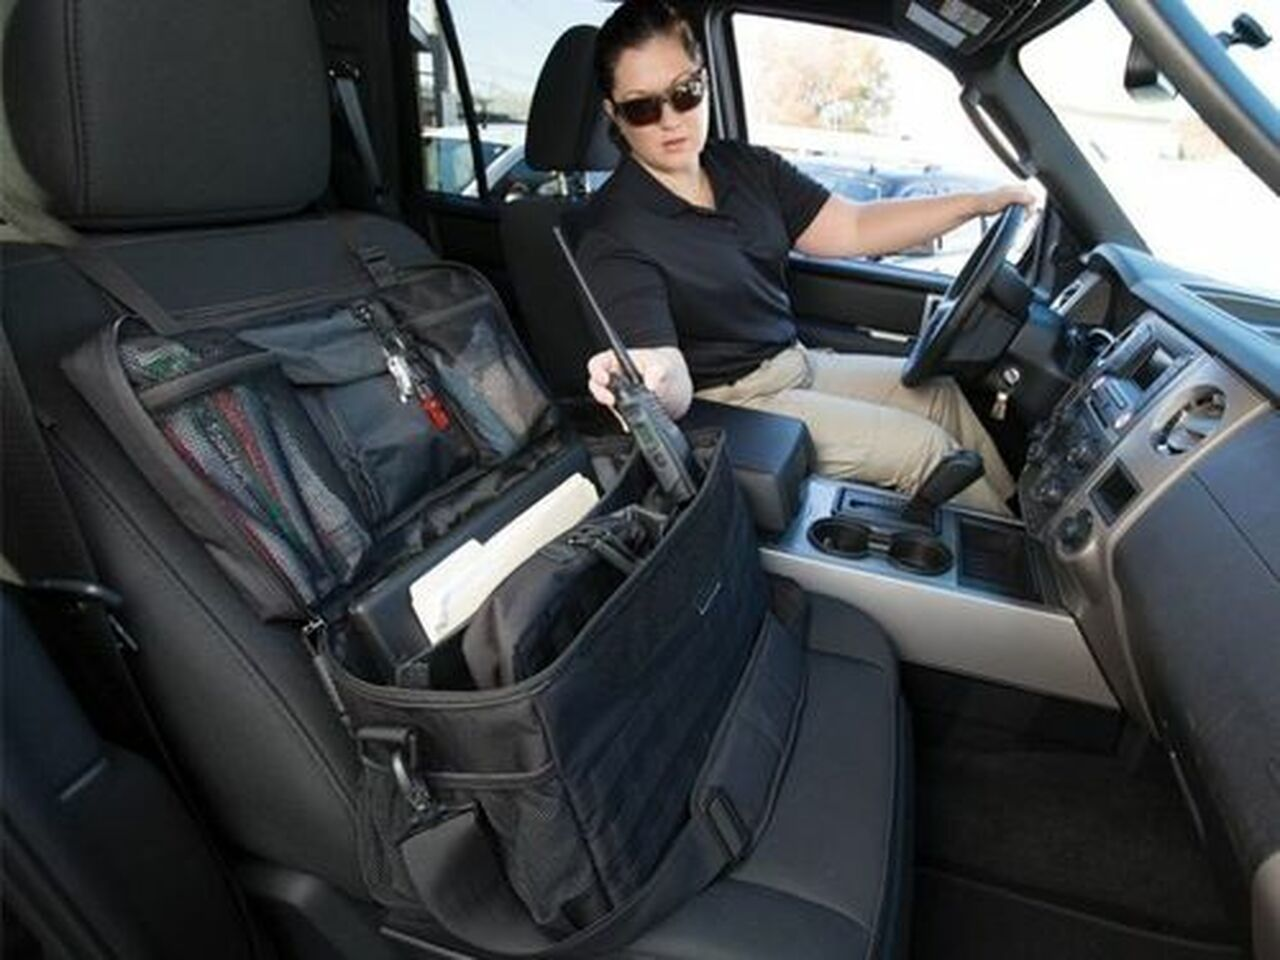 Propper Tactical Patrol Bag 100 600d Polyester With Adjustable